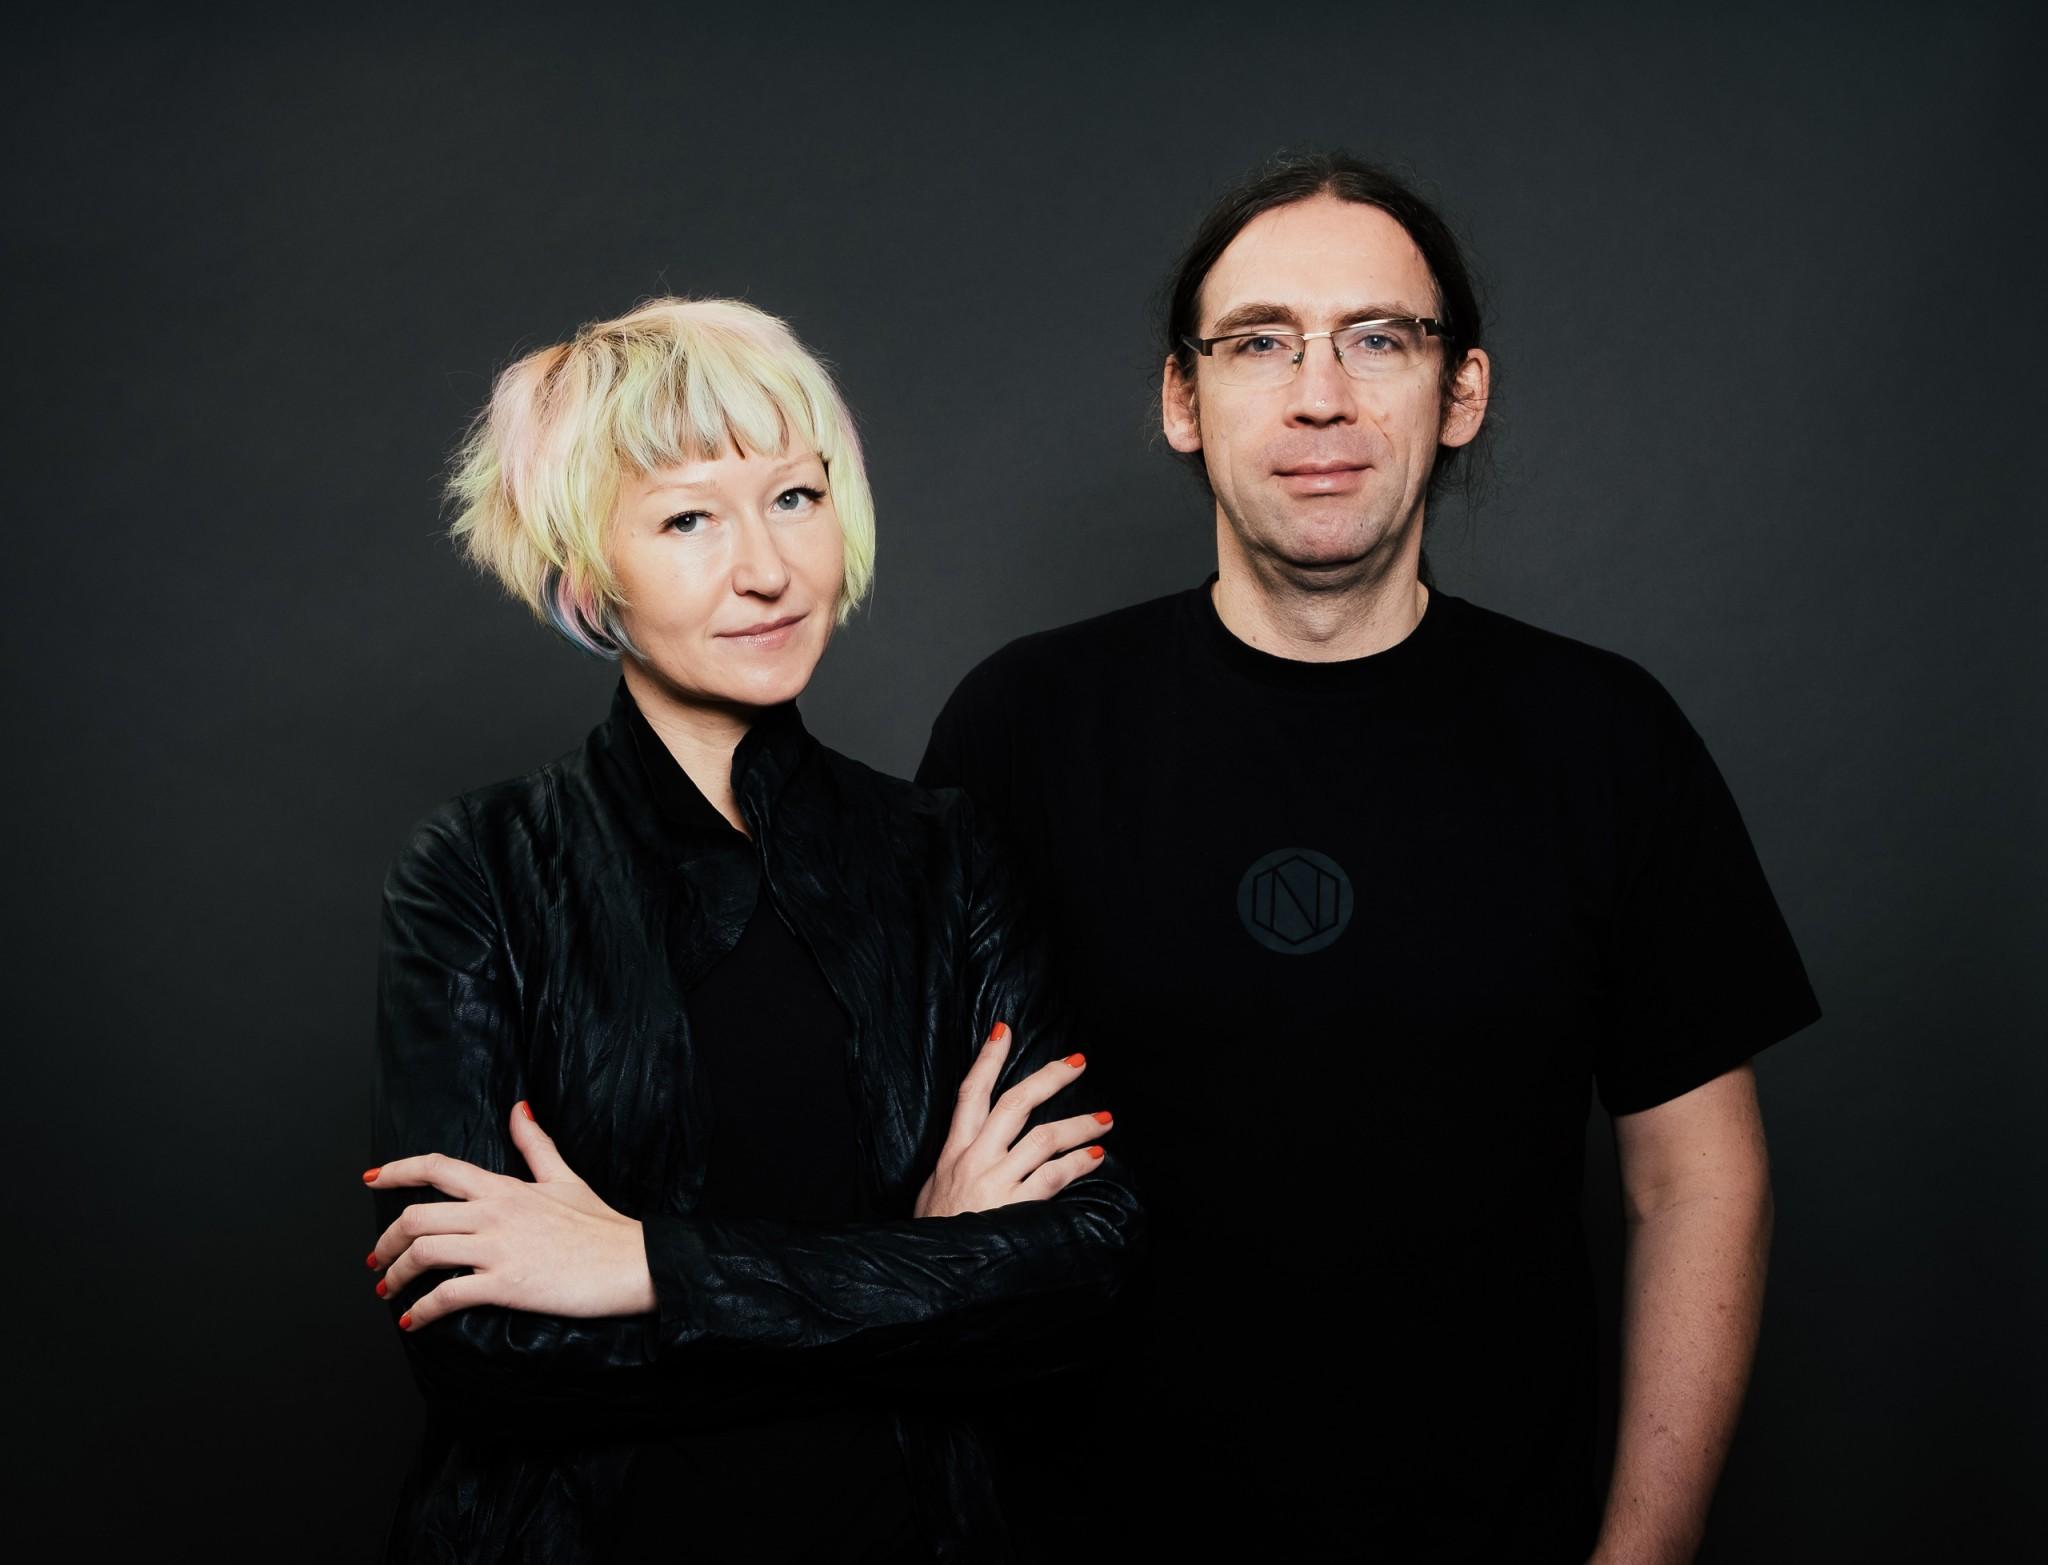 Zoe Adamovicz and Marcin Rudolf, Co-Founders